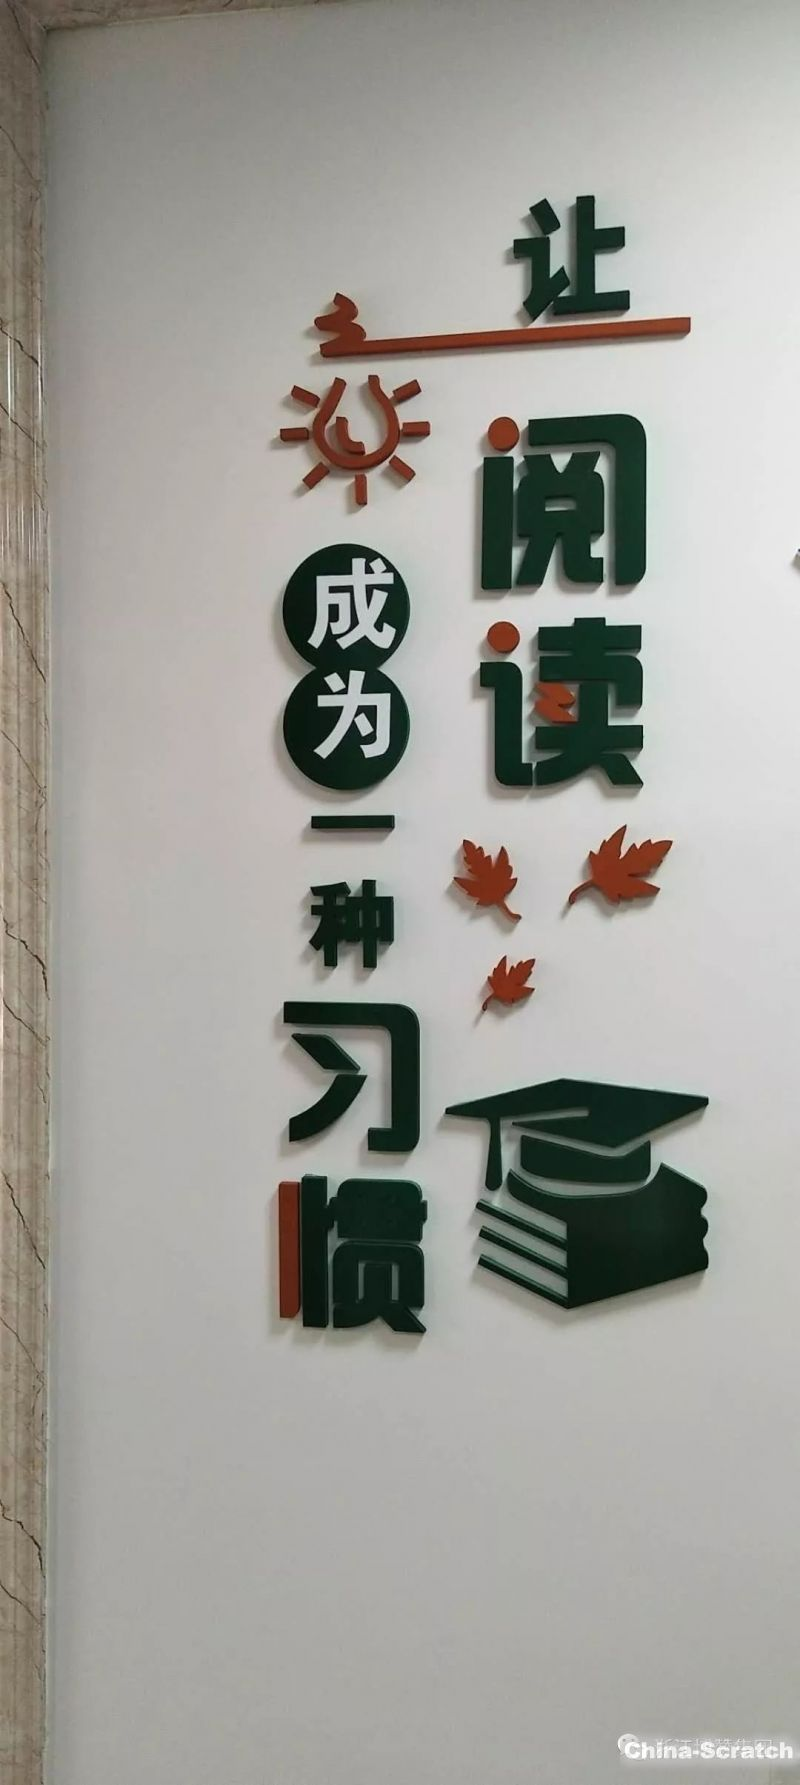 https://www.china-scratch.com/Uploads/timg/190617/16302G460-28.jpg